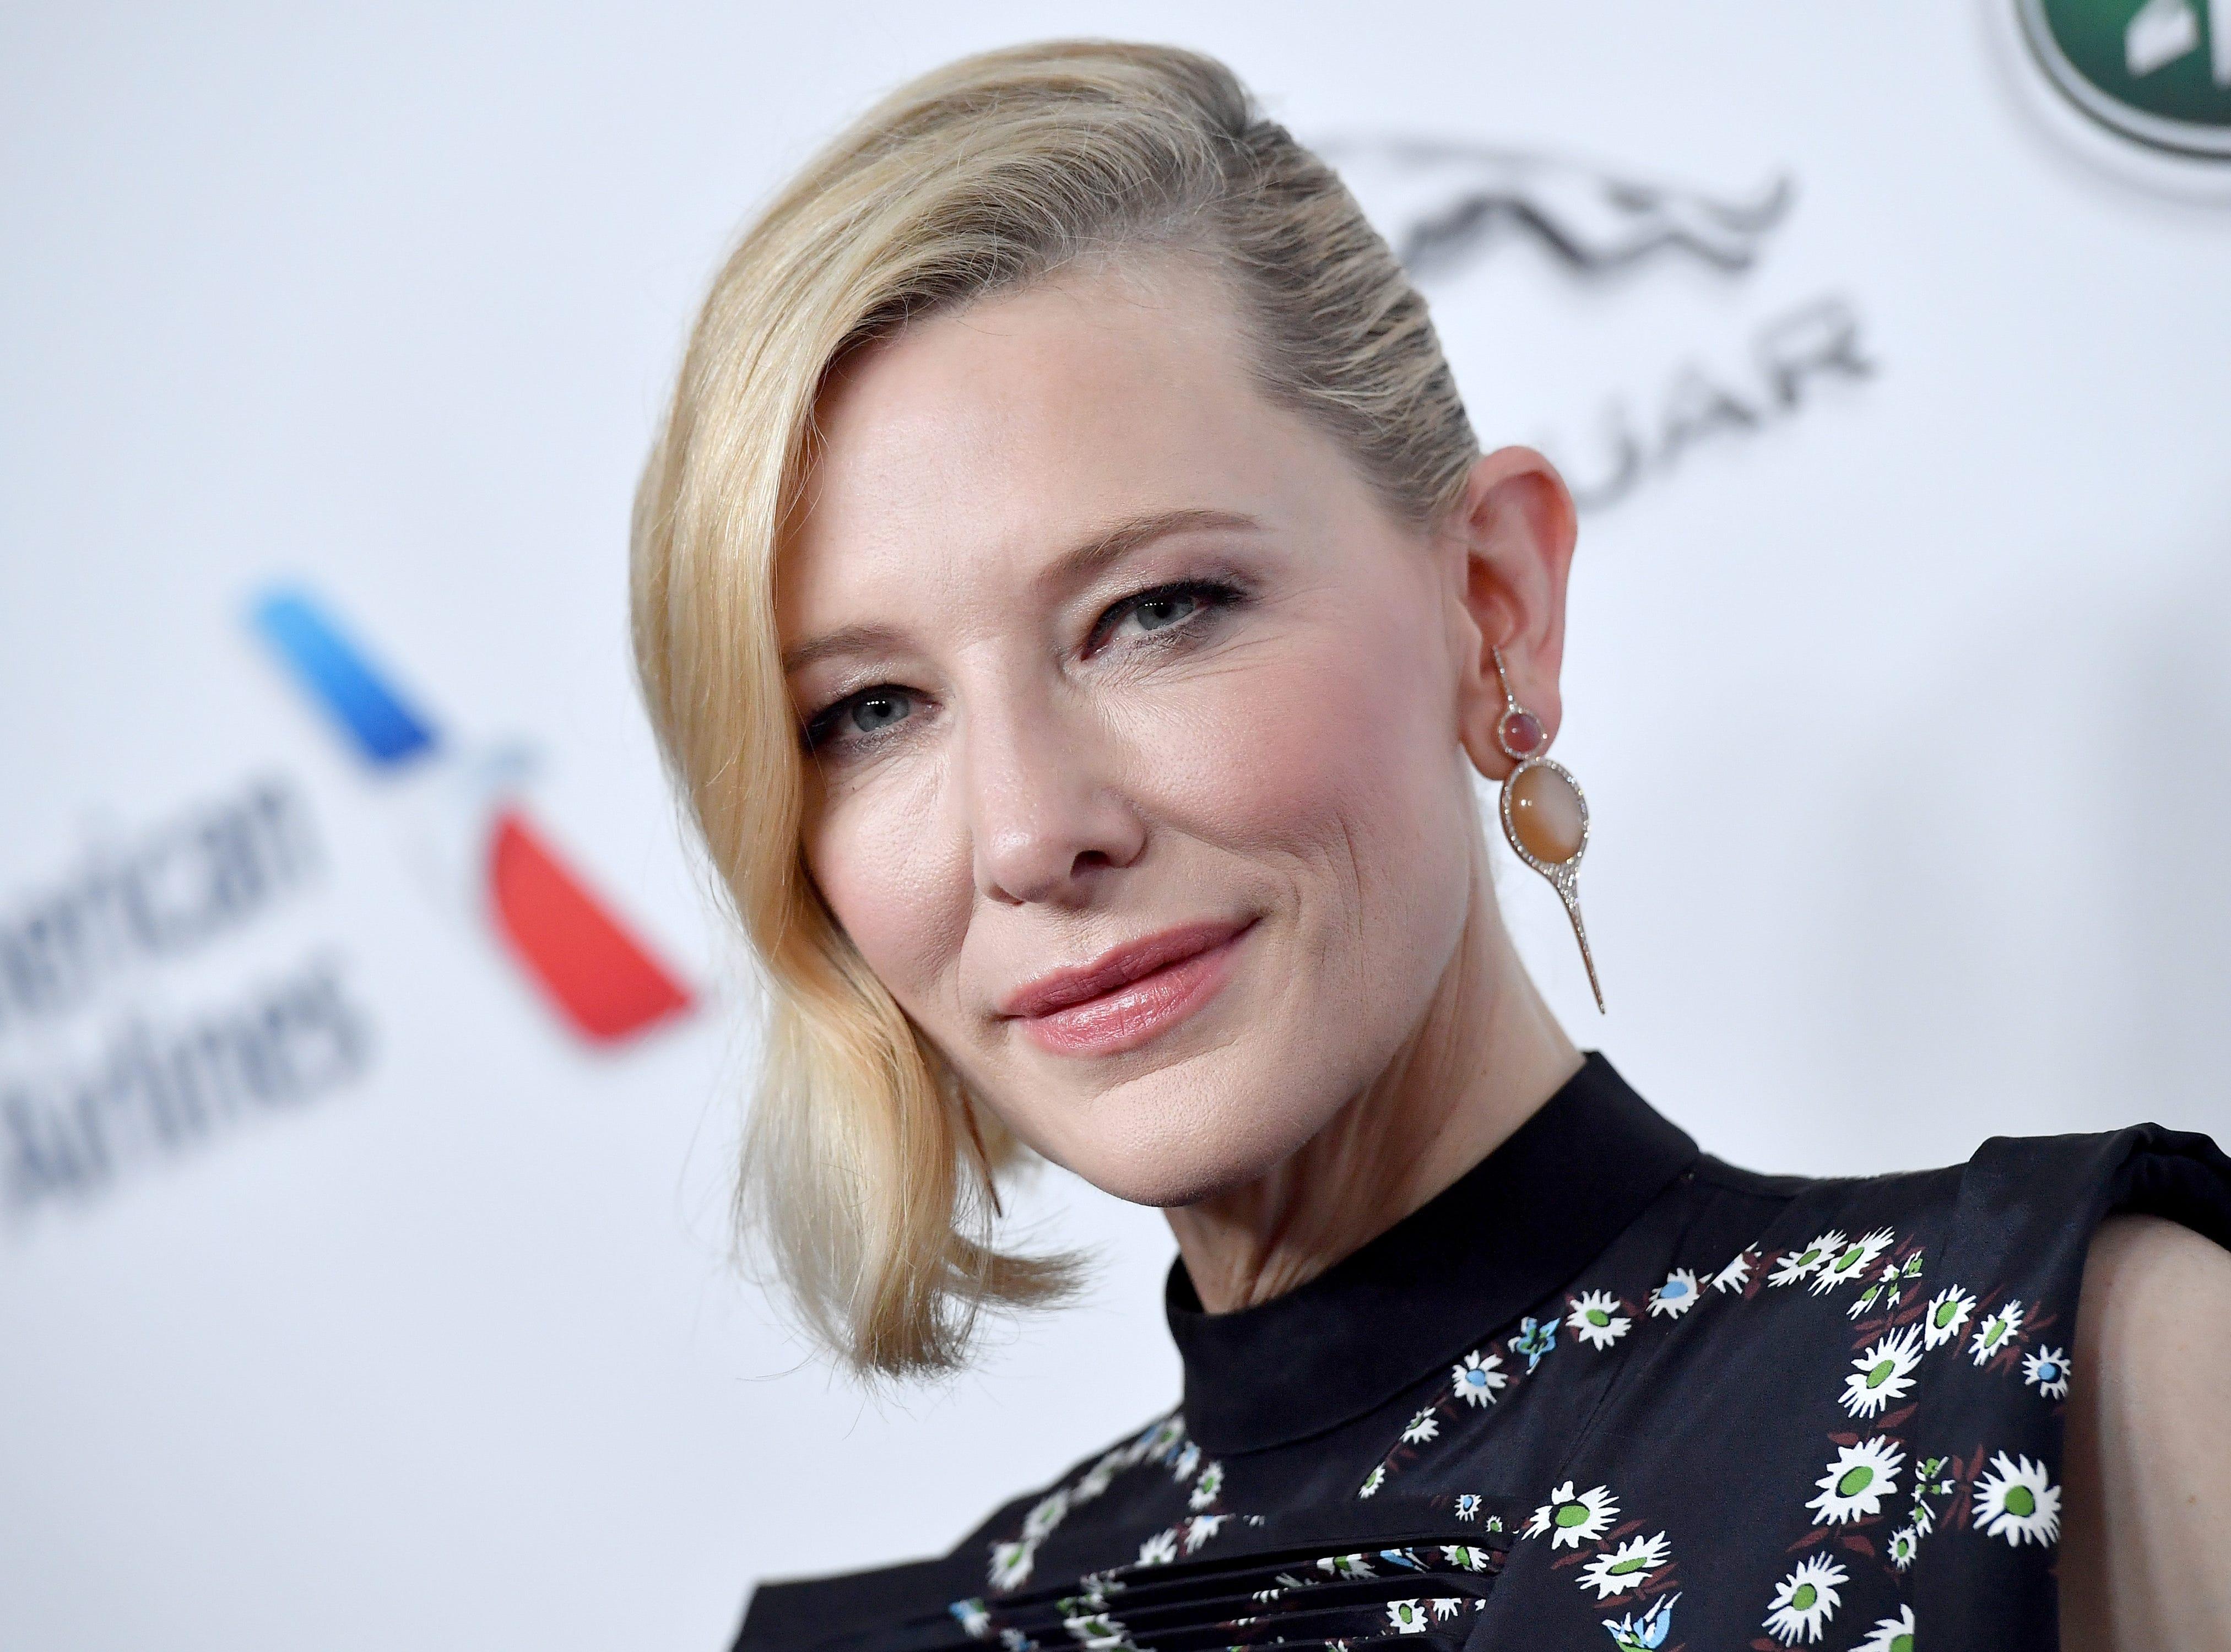 Cate Blanchett turns 50 on May 14.